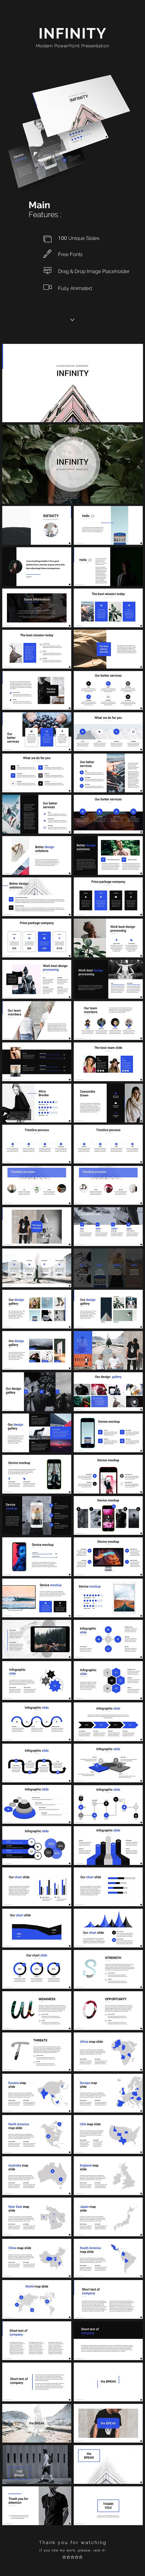 Infinity PowerPont Template - PowerPoint Templates Presentation Templates